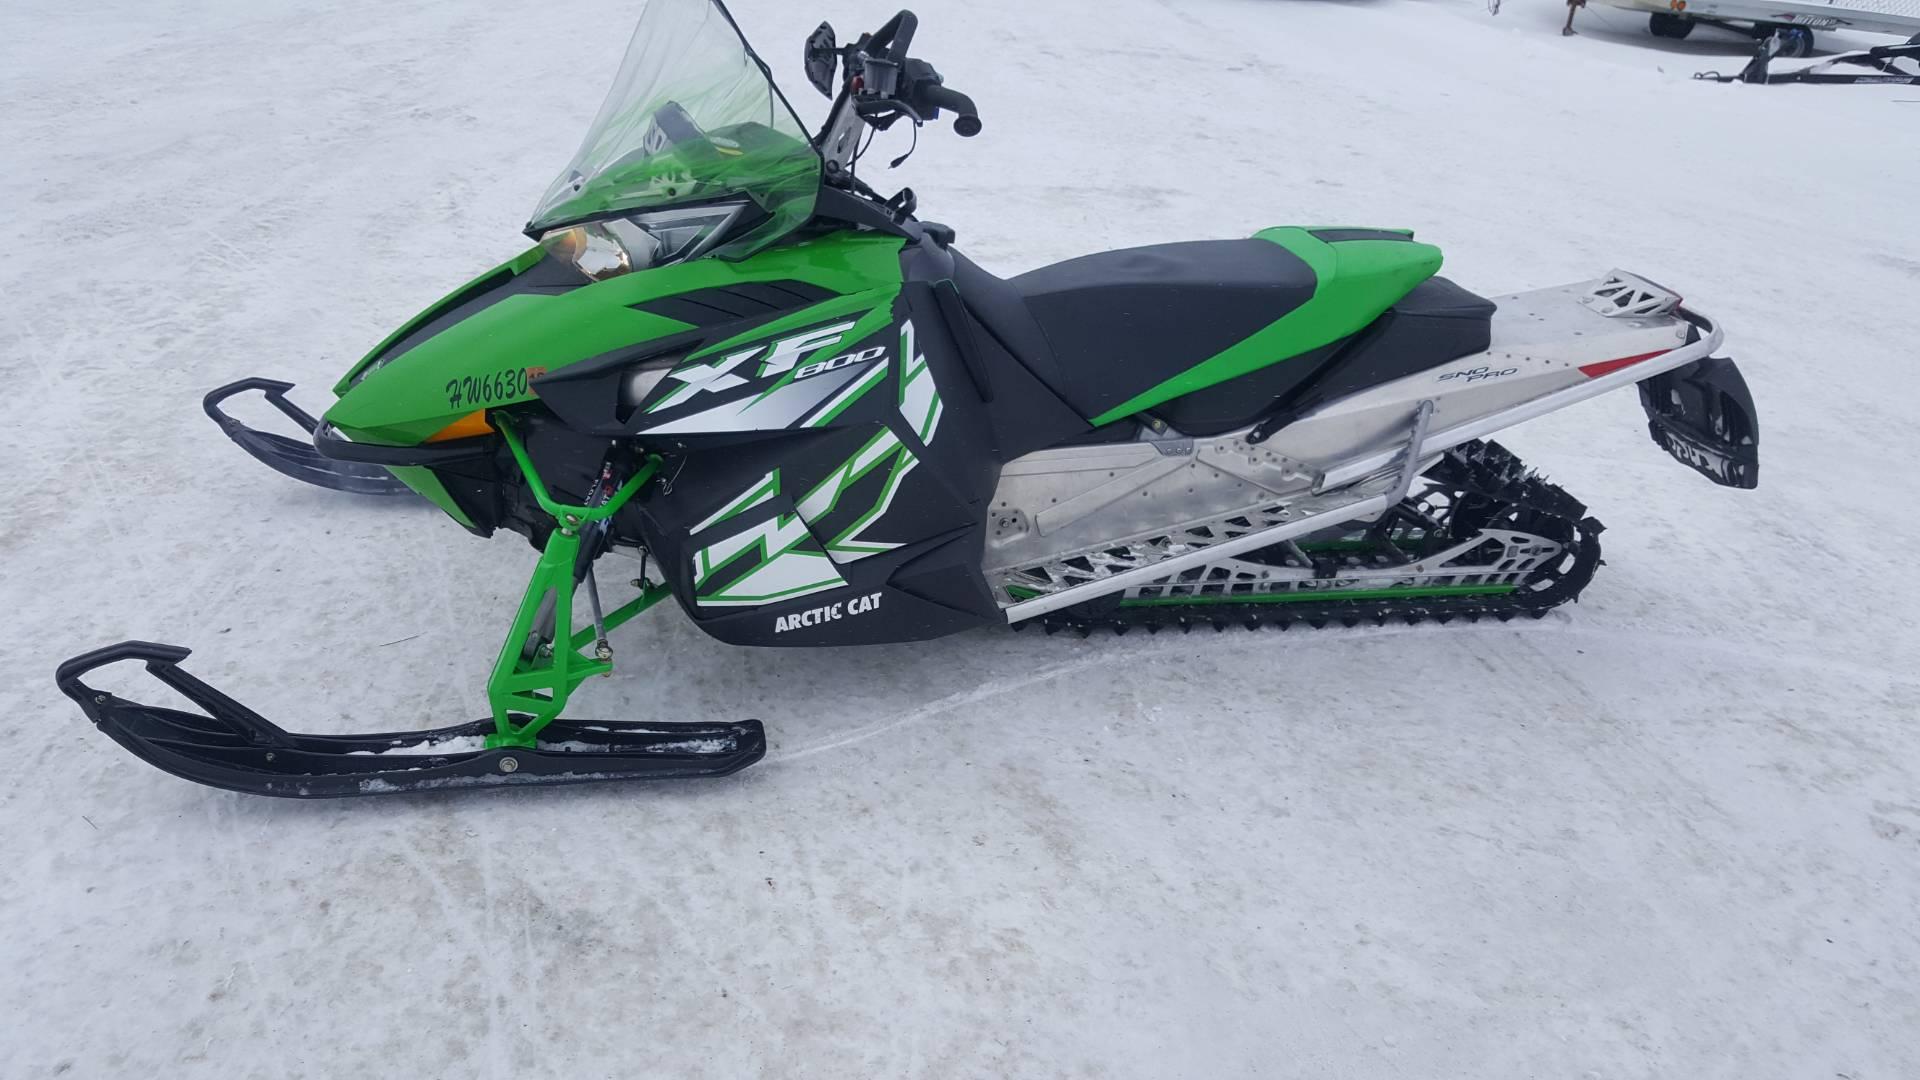 2012 XF 800 Sno Pro